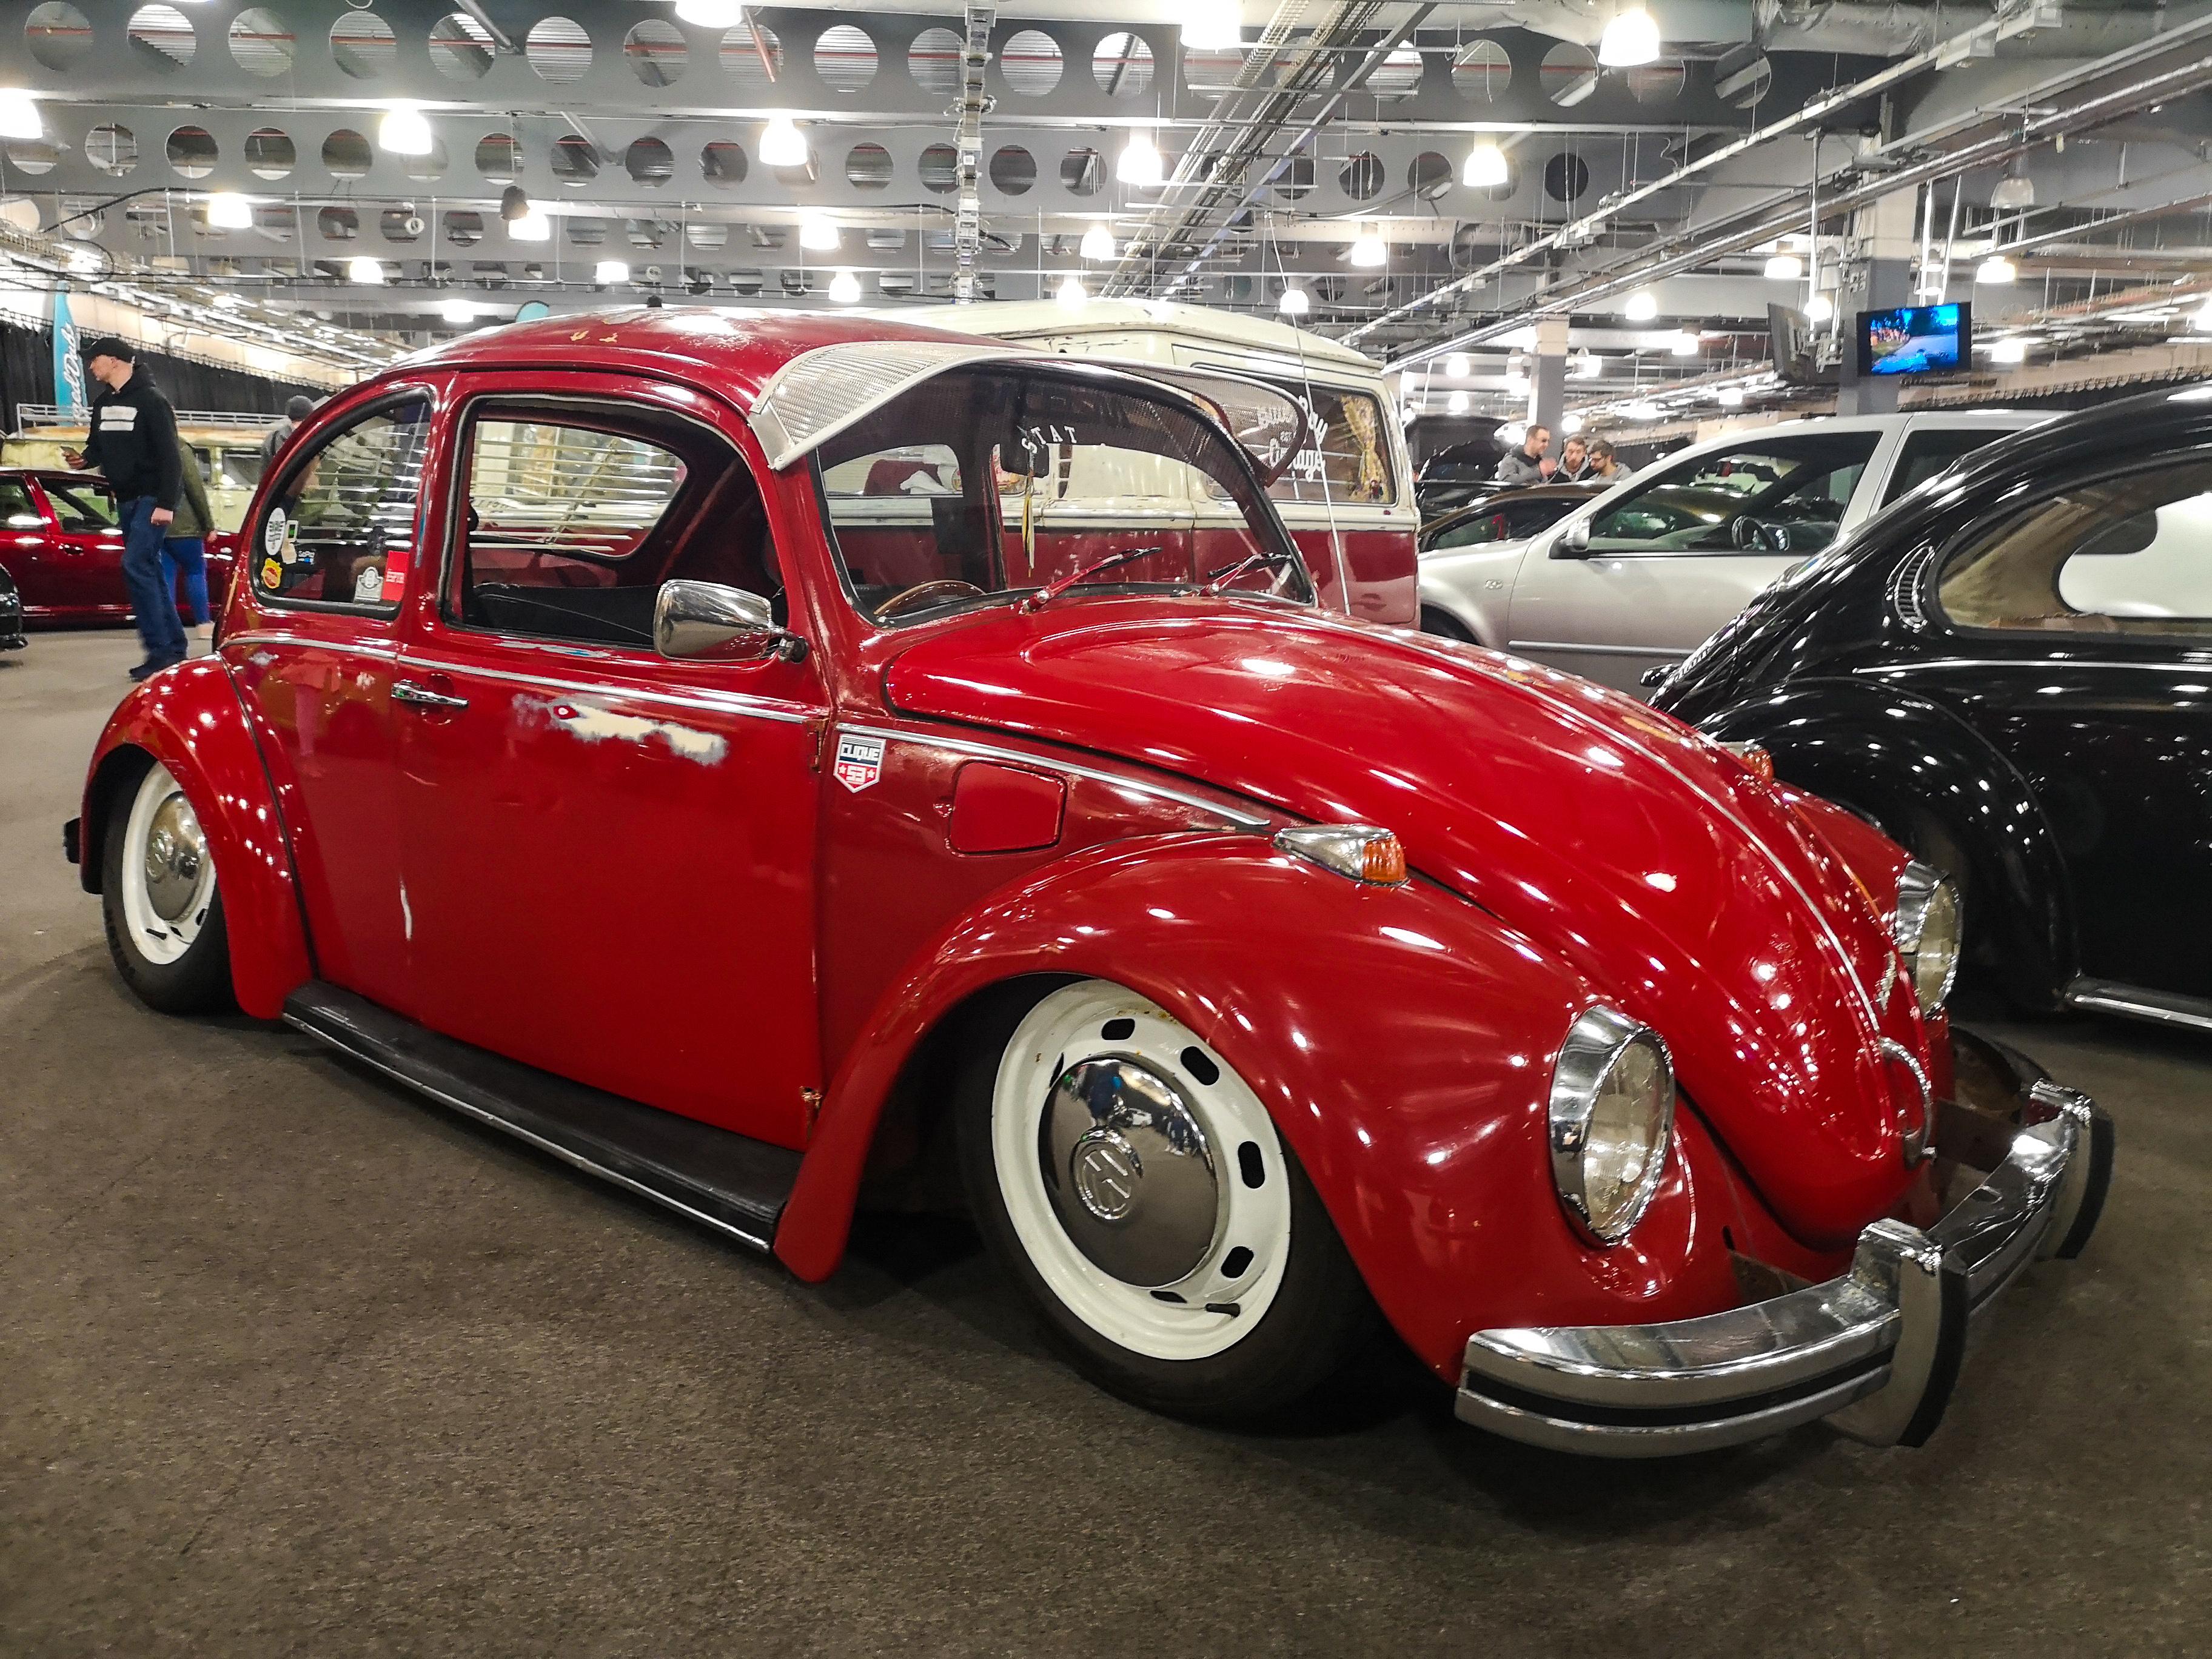 Red VW Beetle Air Cooled Cali Look